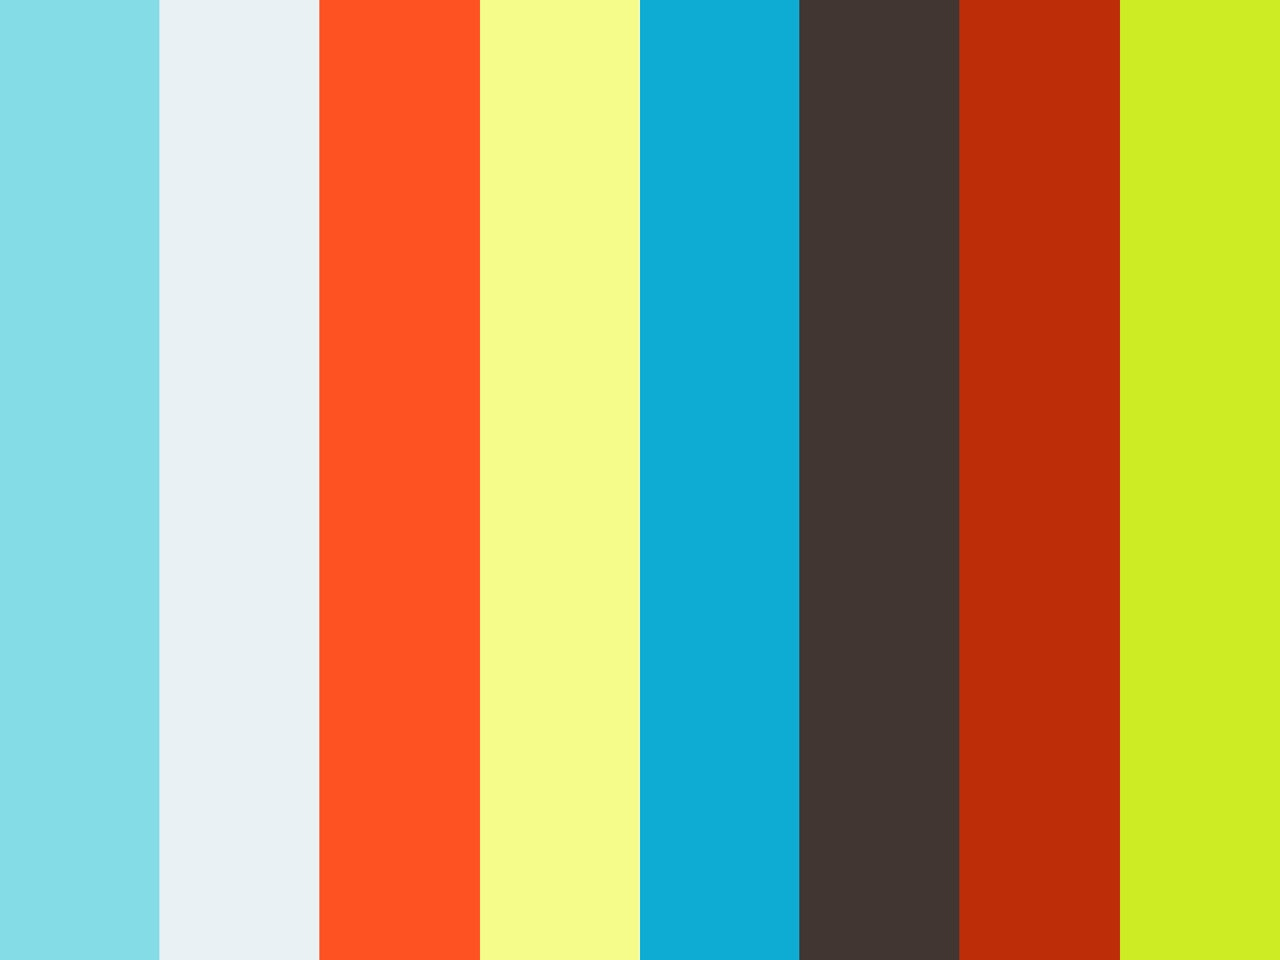 LAURENCE ANYWAYS | Xavier Dolan |Trailer (German)